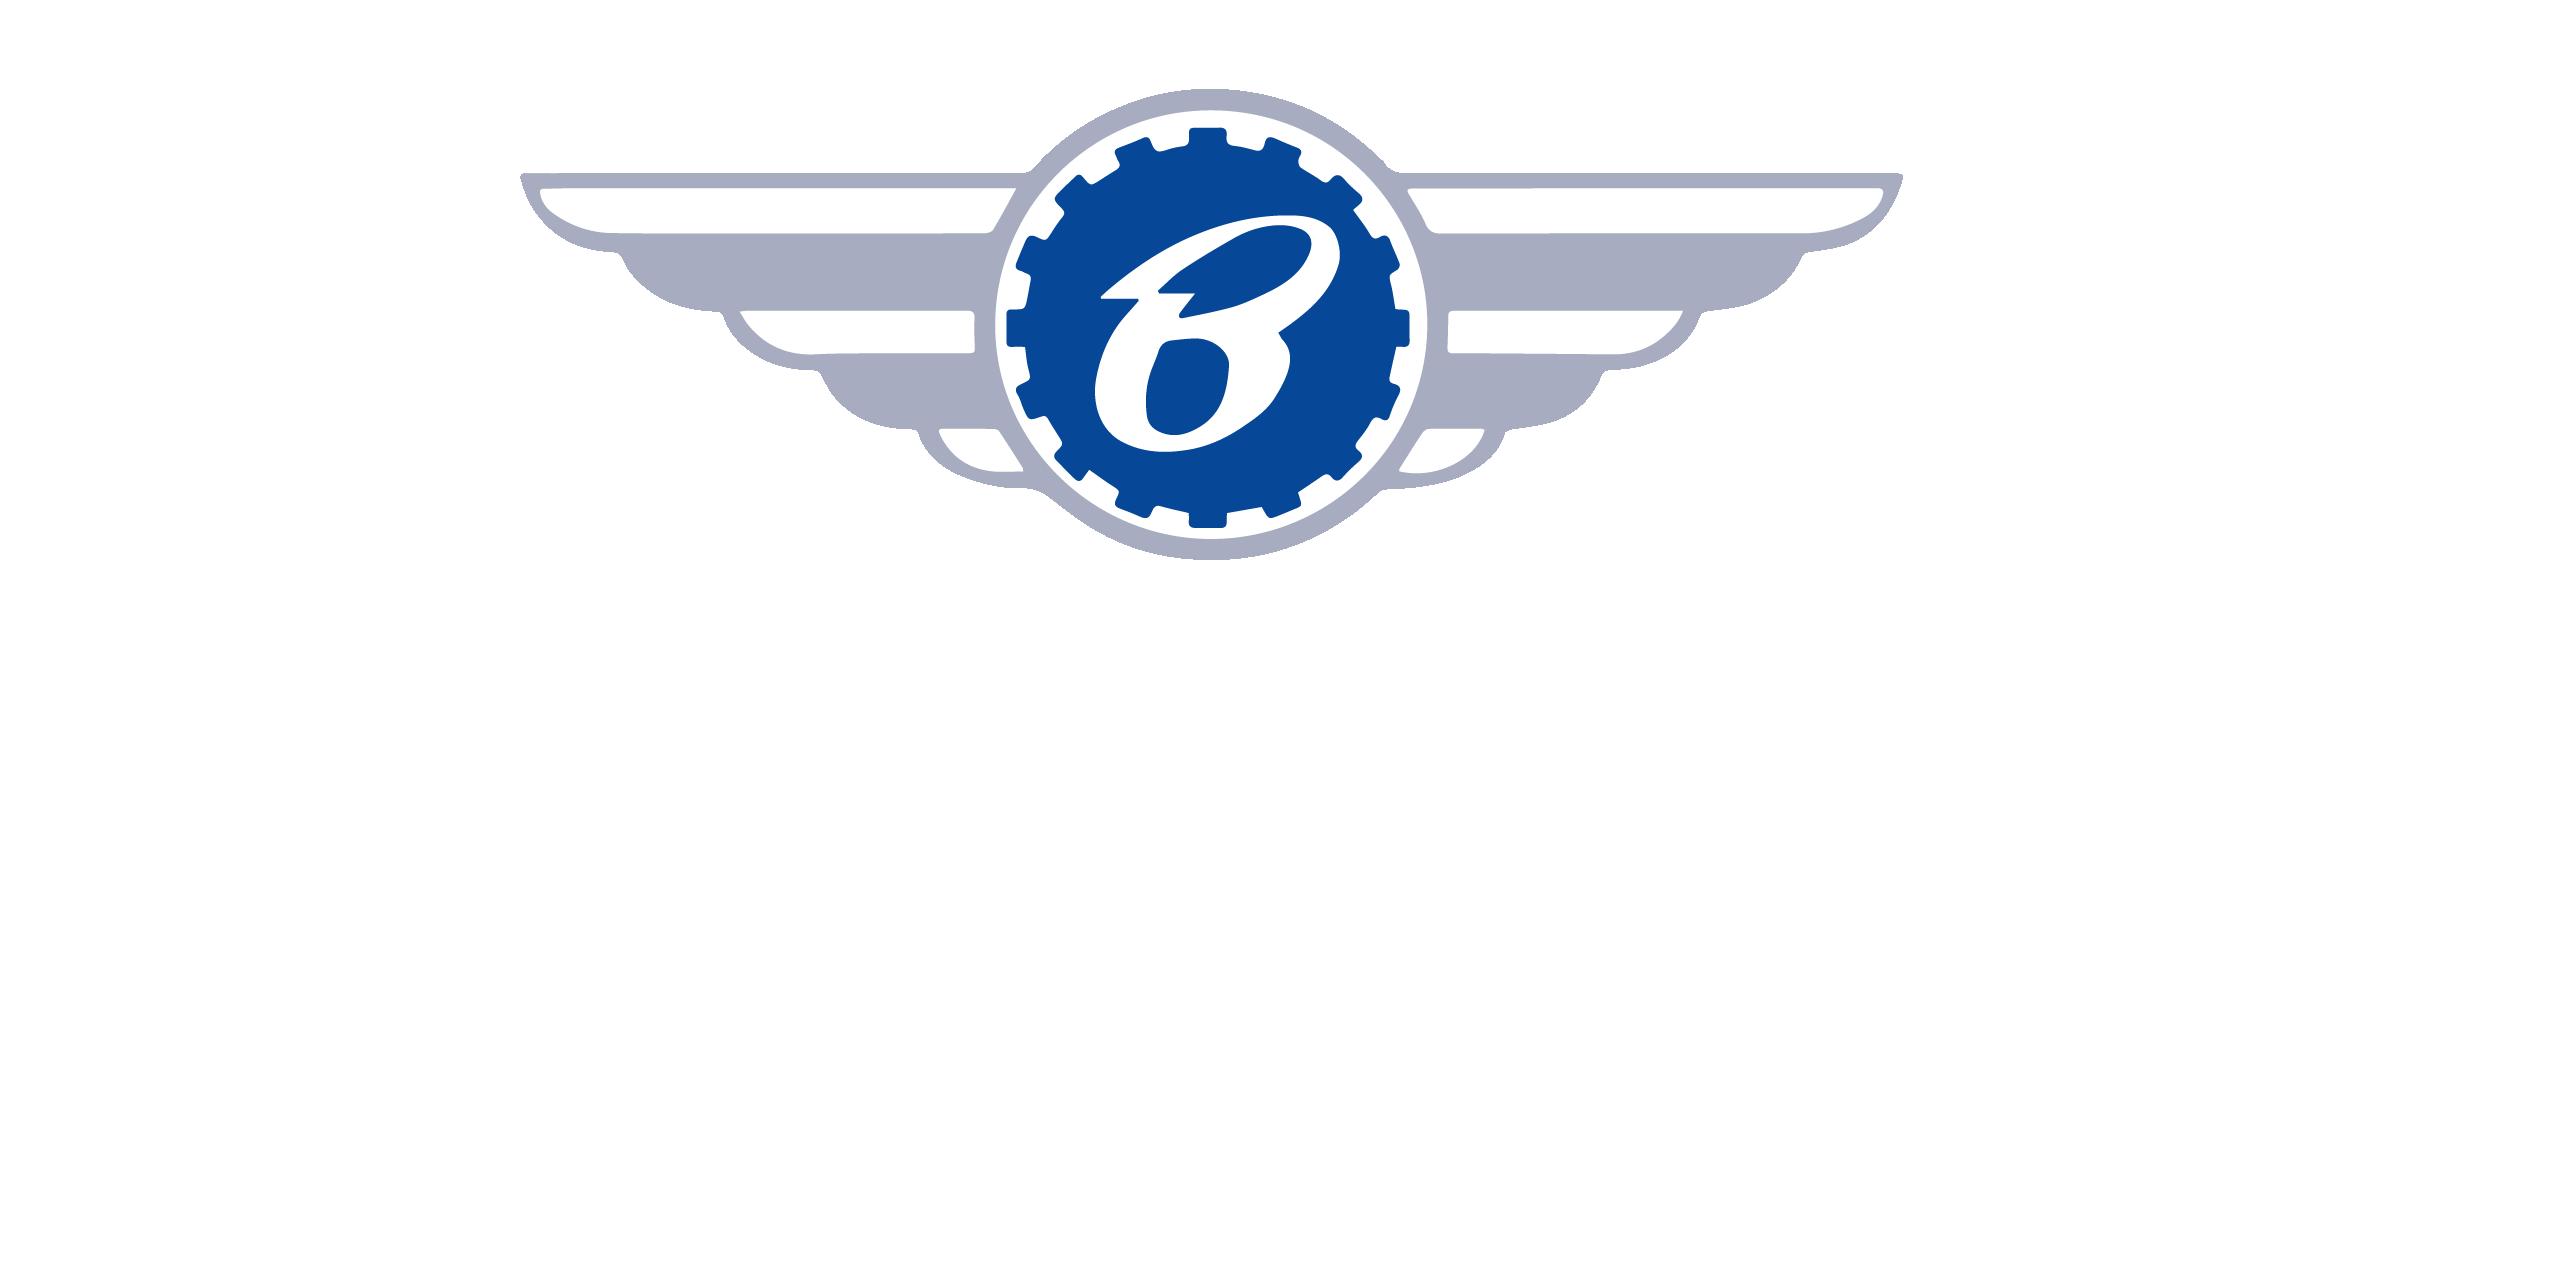 Since 1923